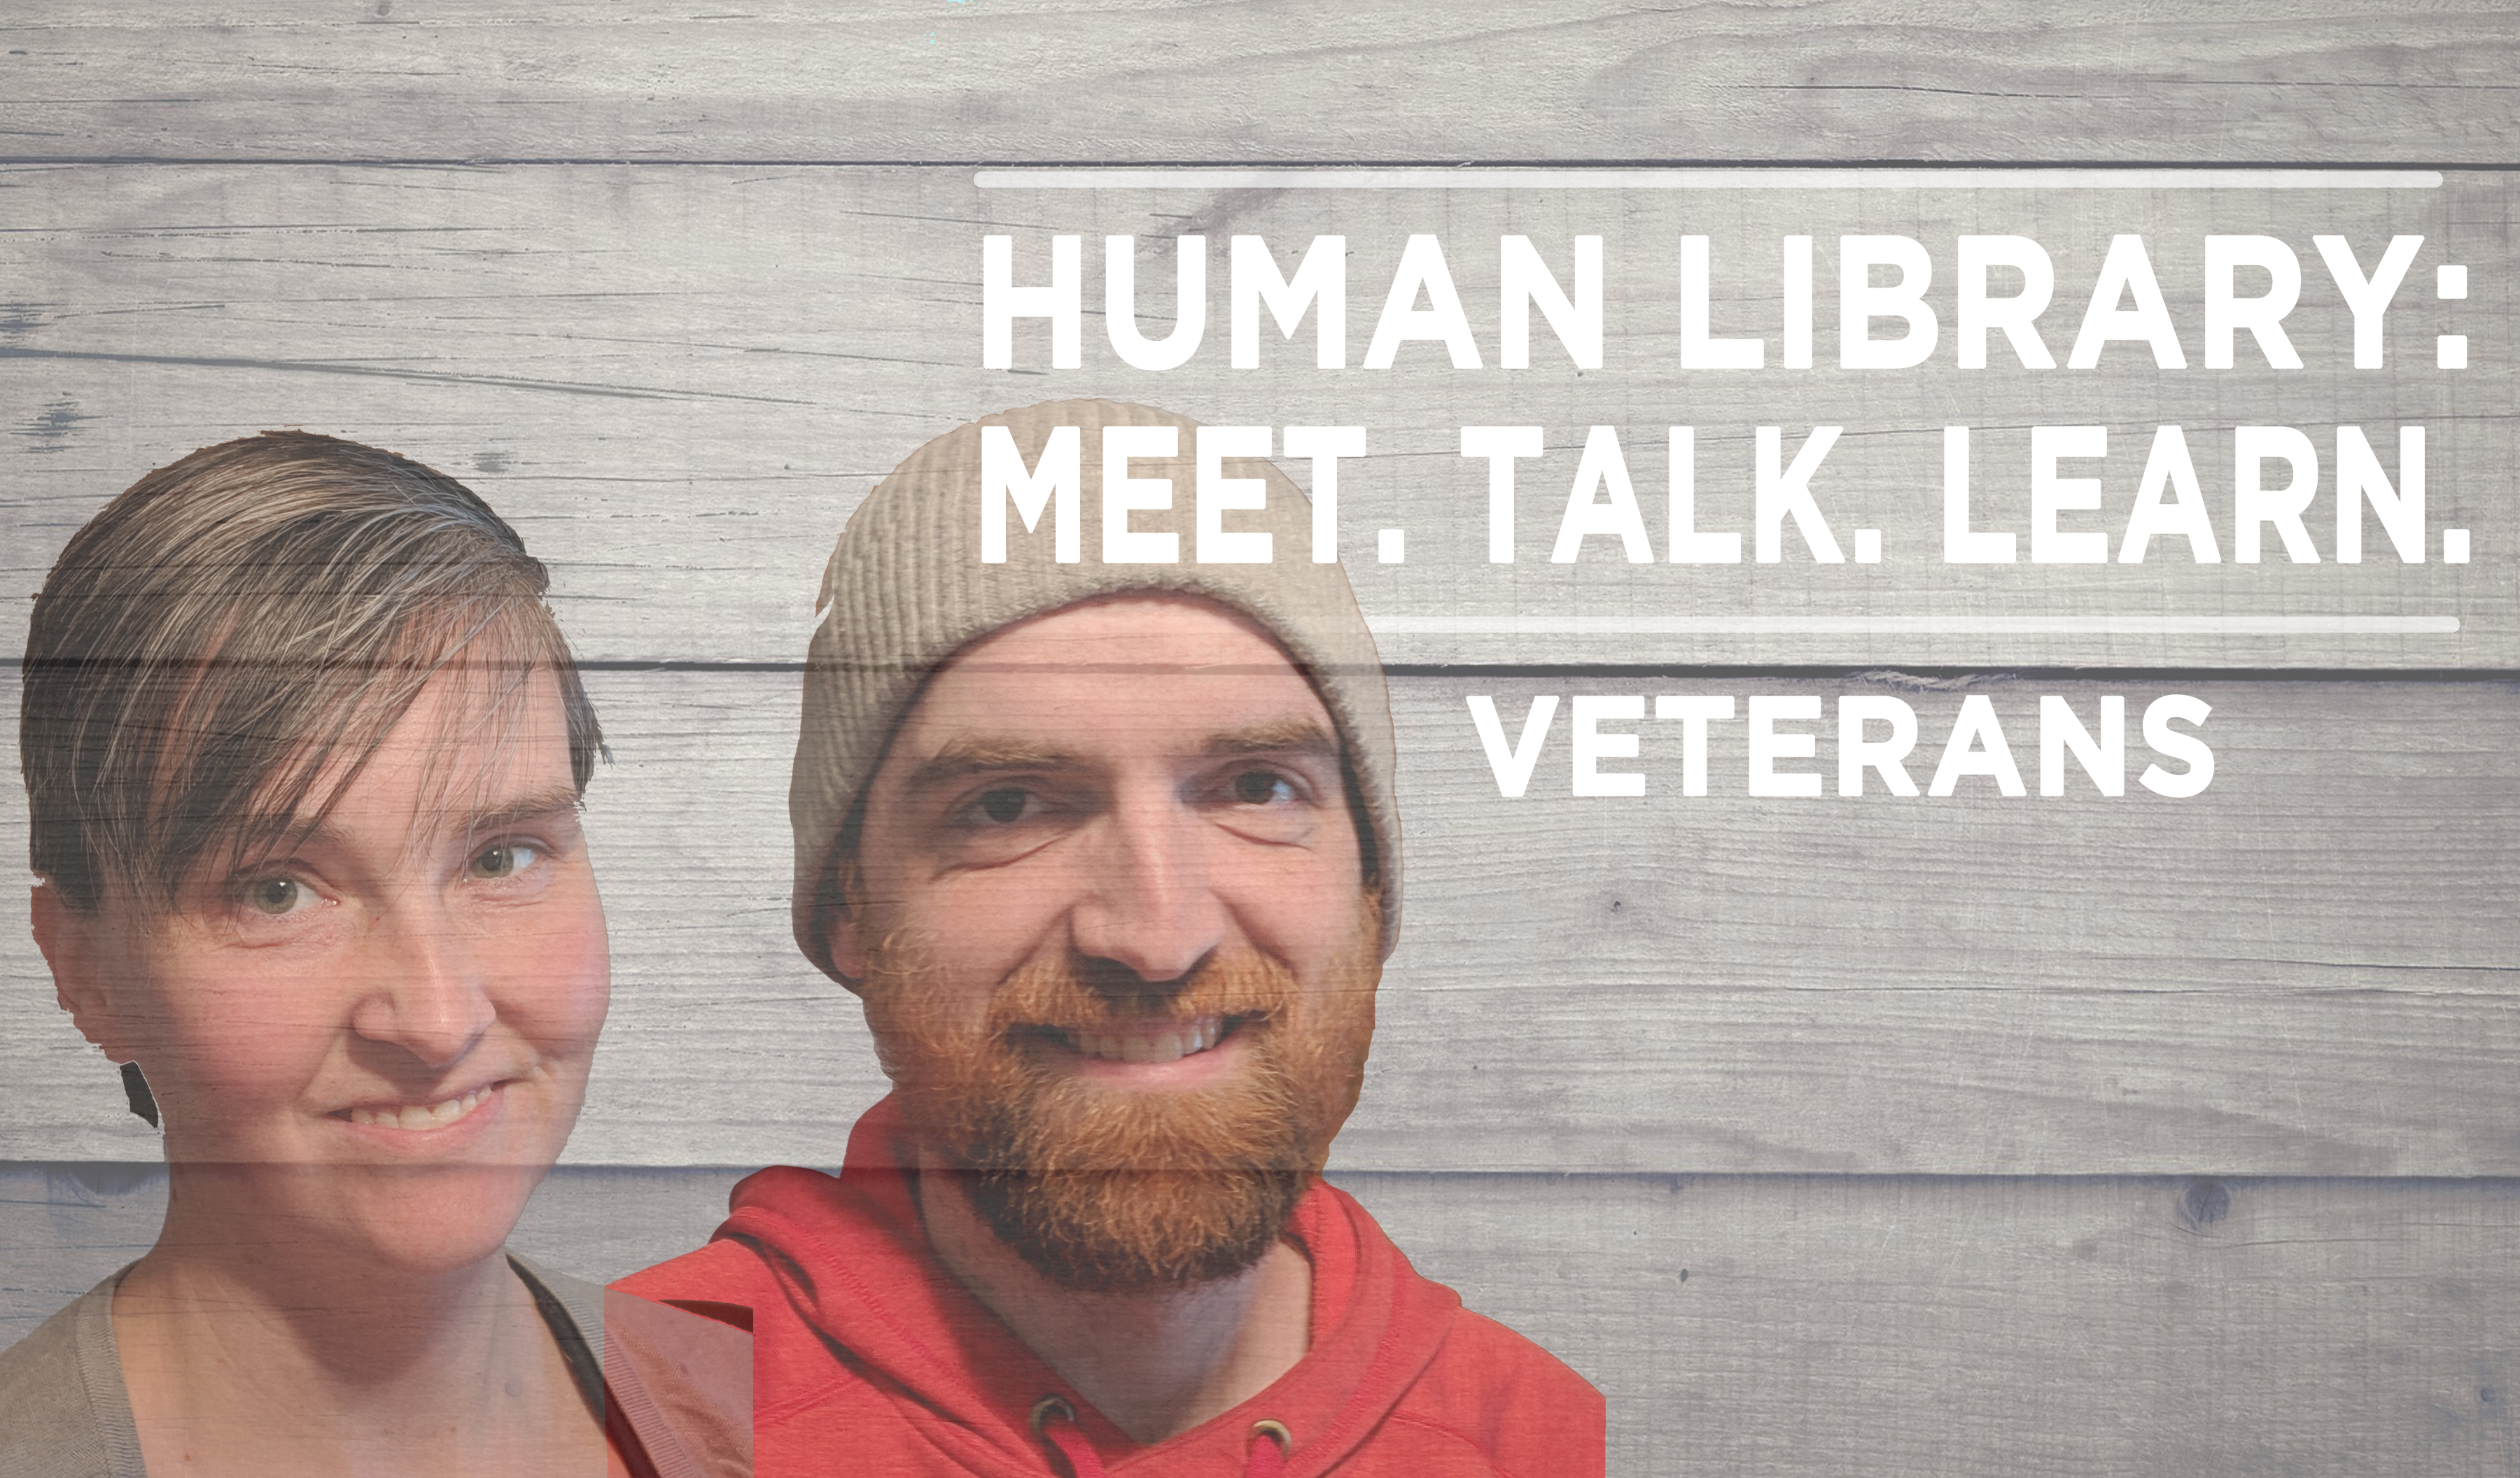 Human Library Logo2 - Veterans